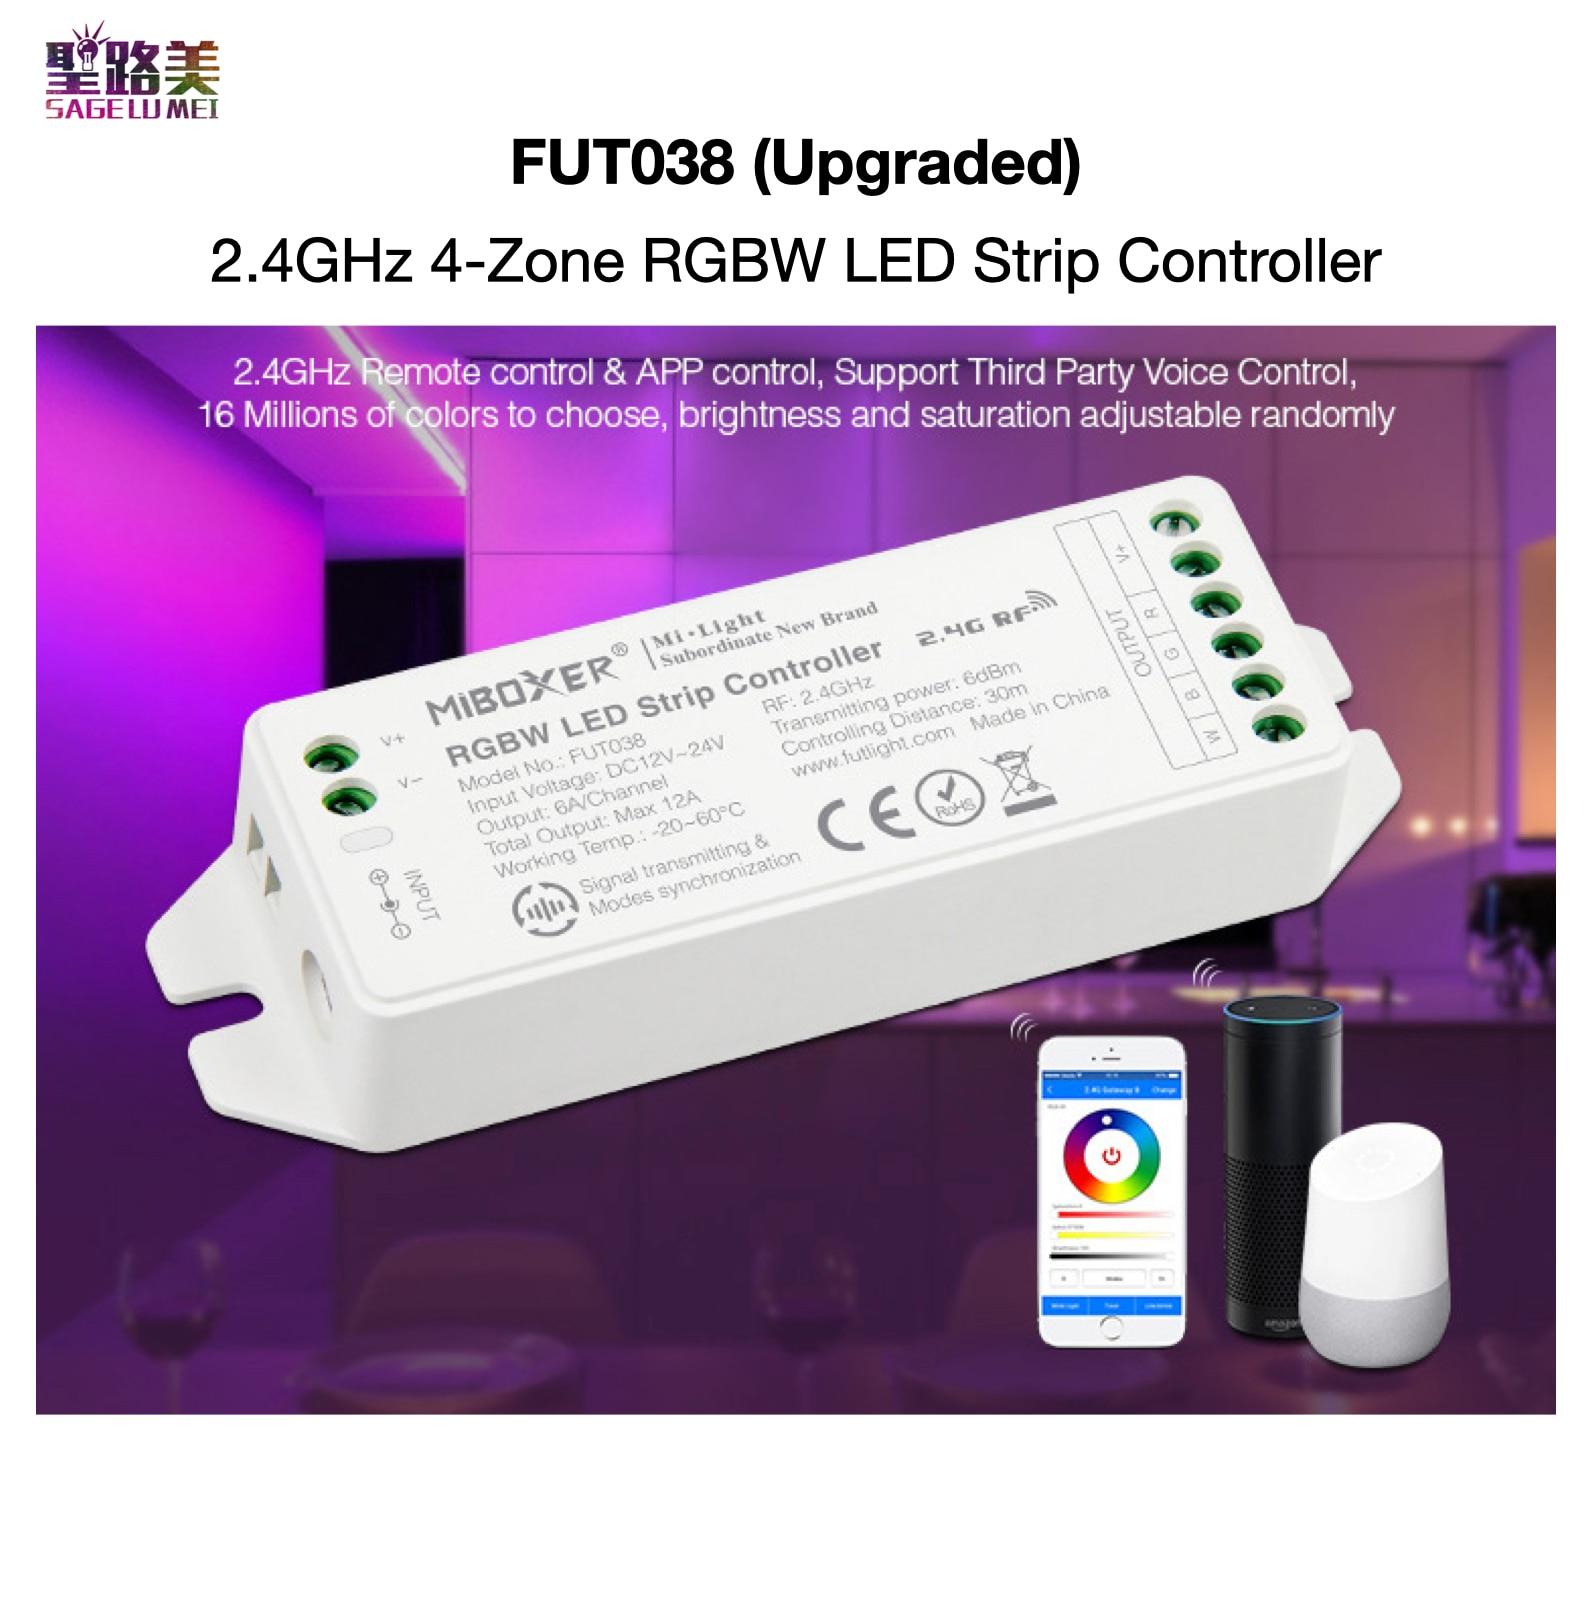 FUT038 (Upgraded) 2.4GHz RGBW LED Strip Controller DC12V~24V Smartphone APP / RF / Third Party Voice Control MiBOXER Mi-Light